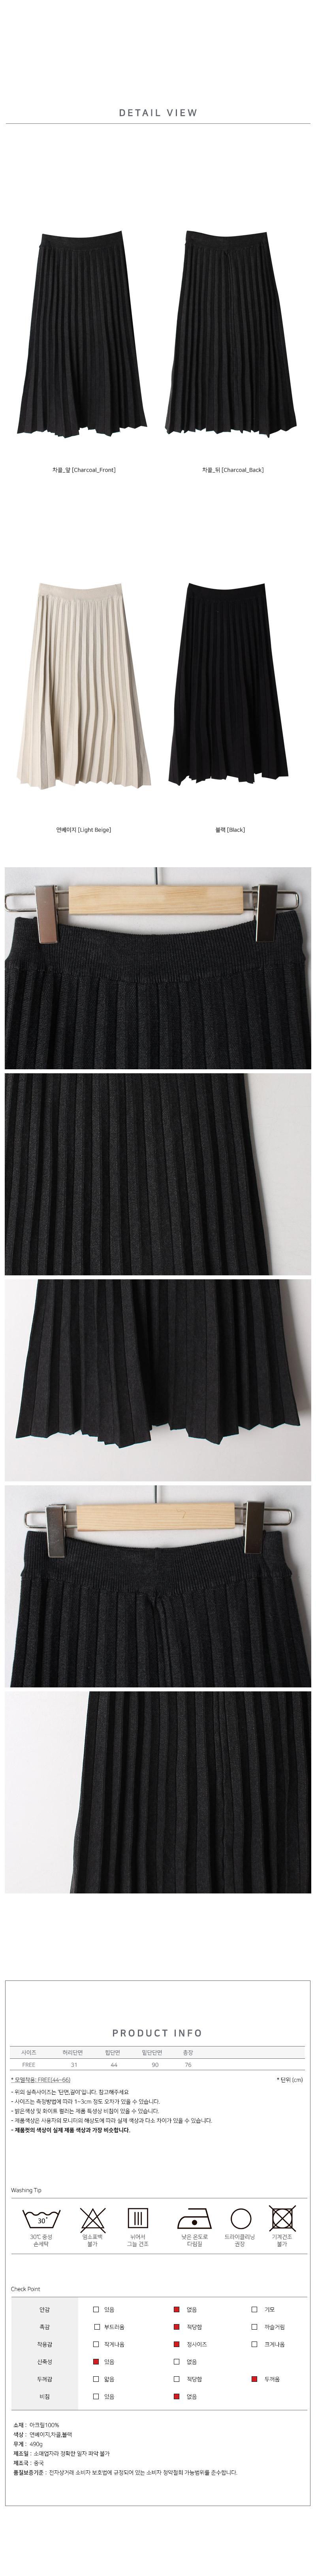 Ruin pleated knit skirt